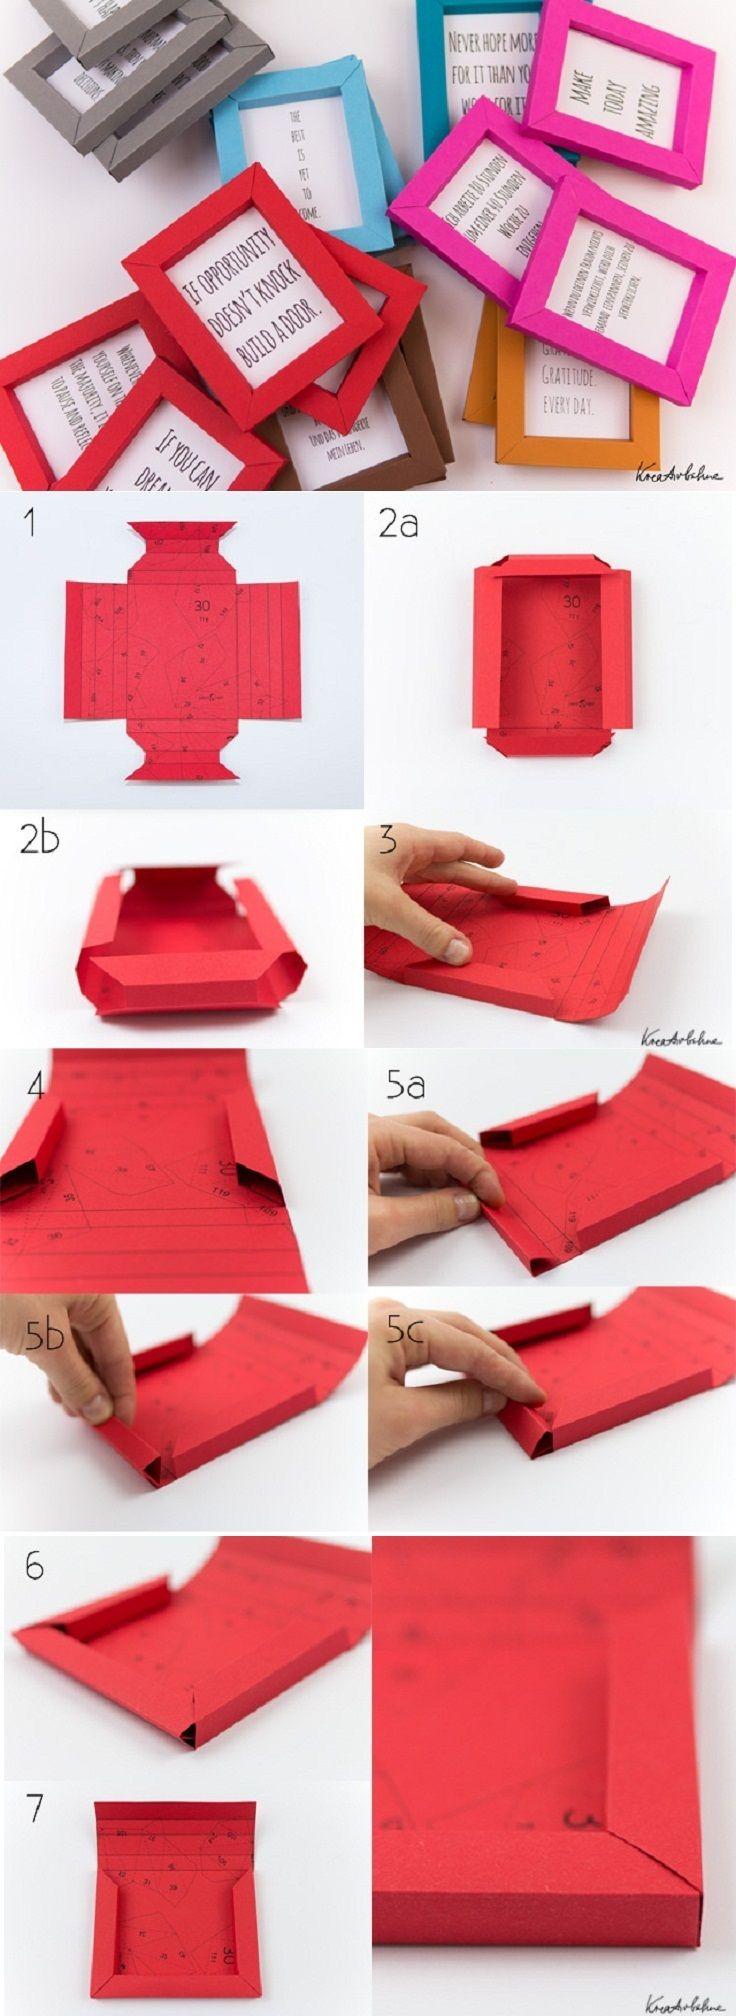 10 Easy Paper Diys To Soothe Your Crafting Needs Bumazhnye Ramki